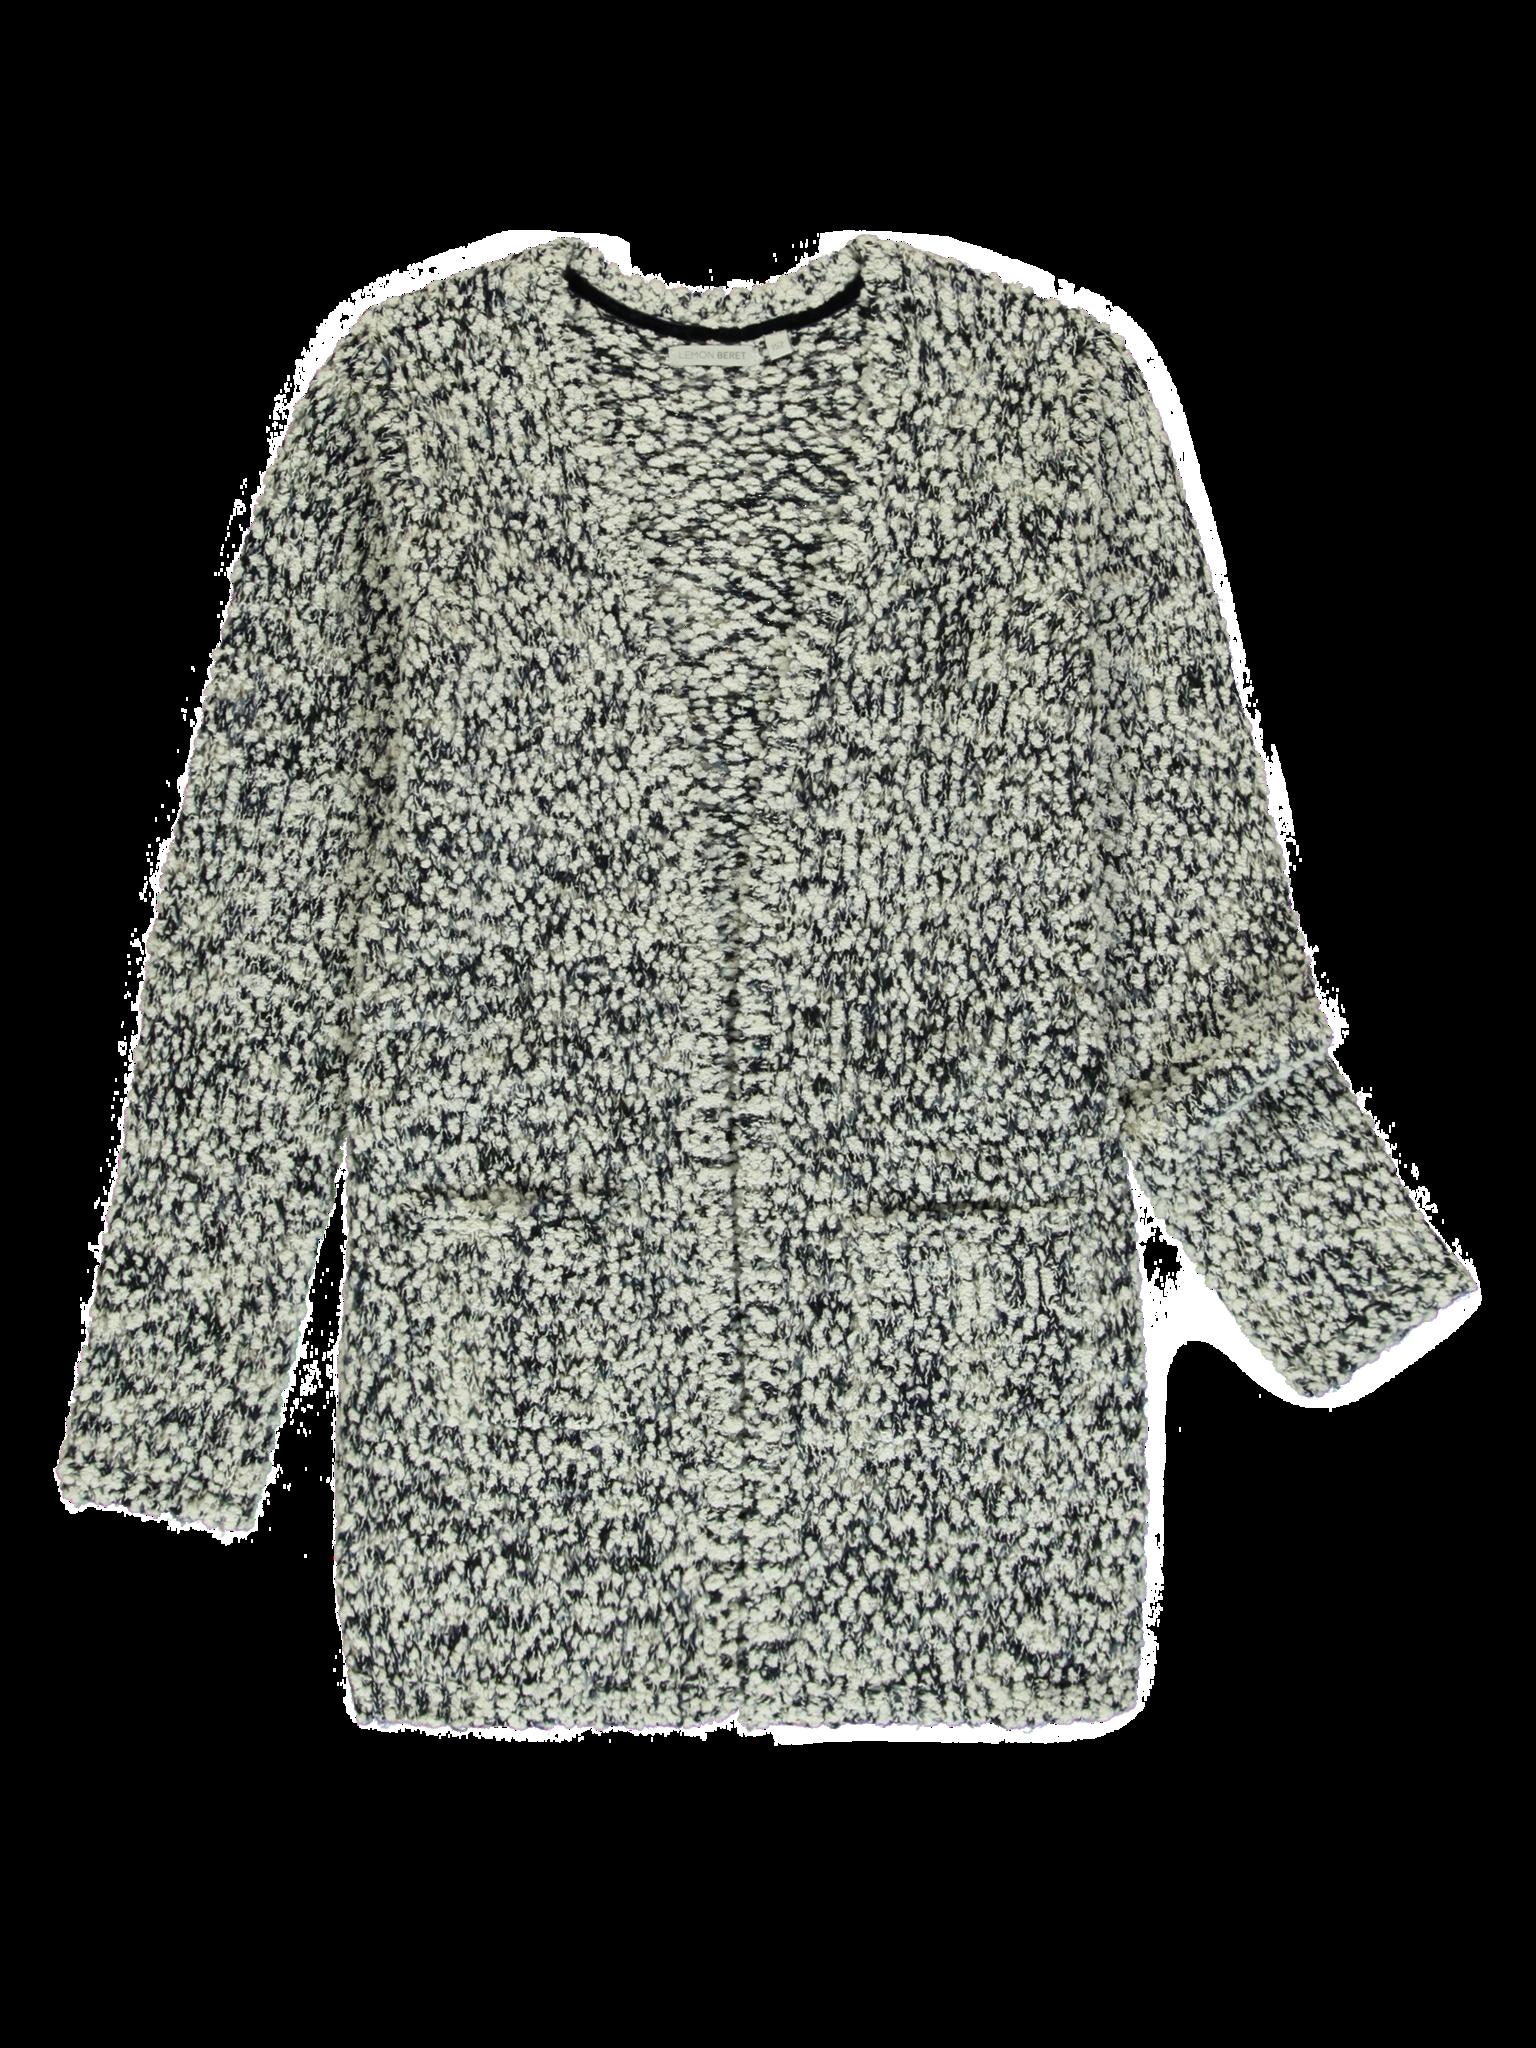 All Brands | Winterproducts Teen Girls | Cardigan Knitwear | 12 pcs/box